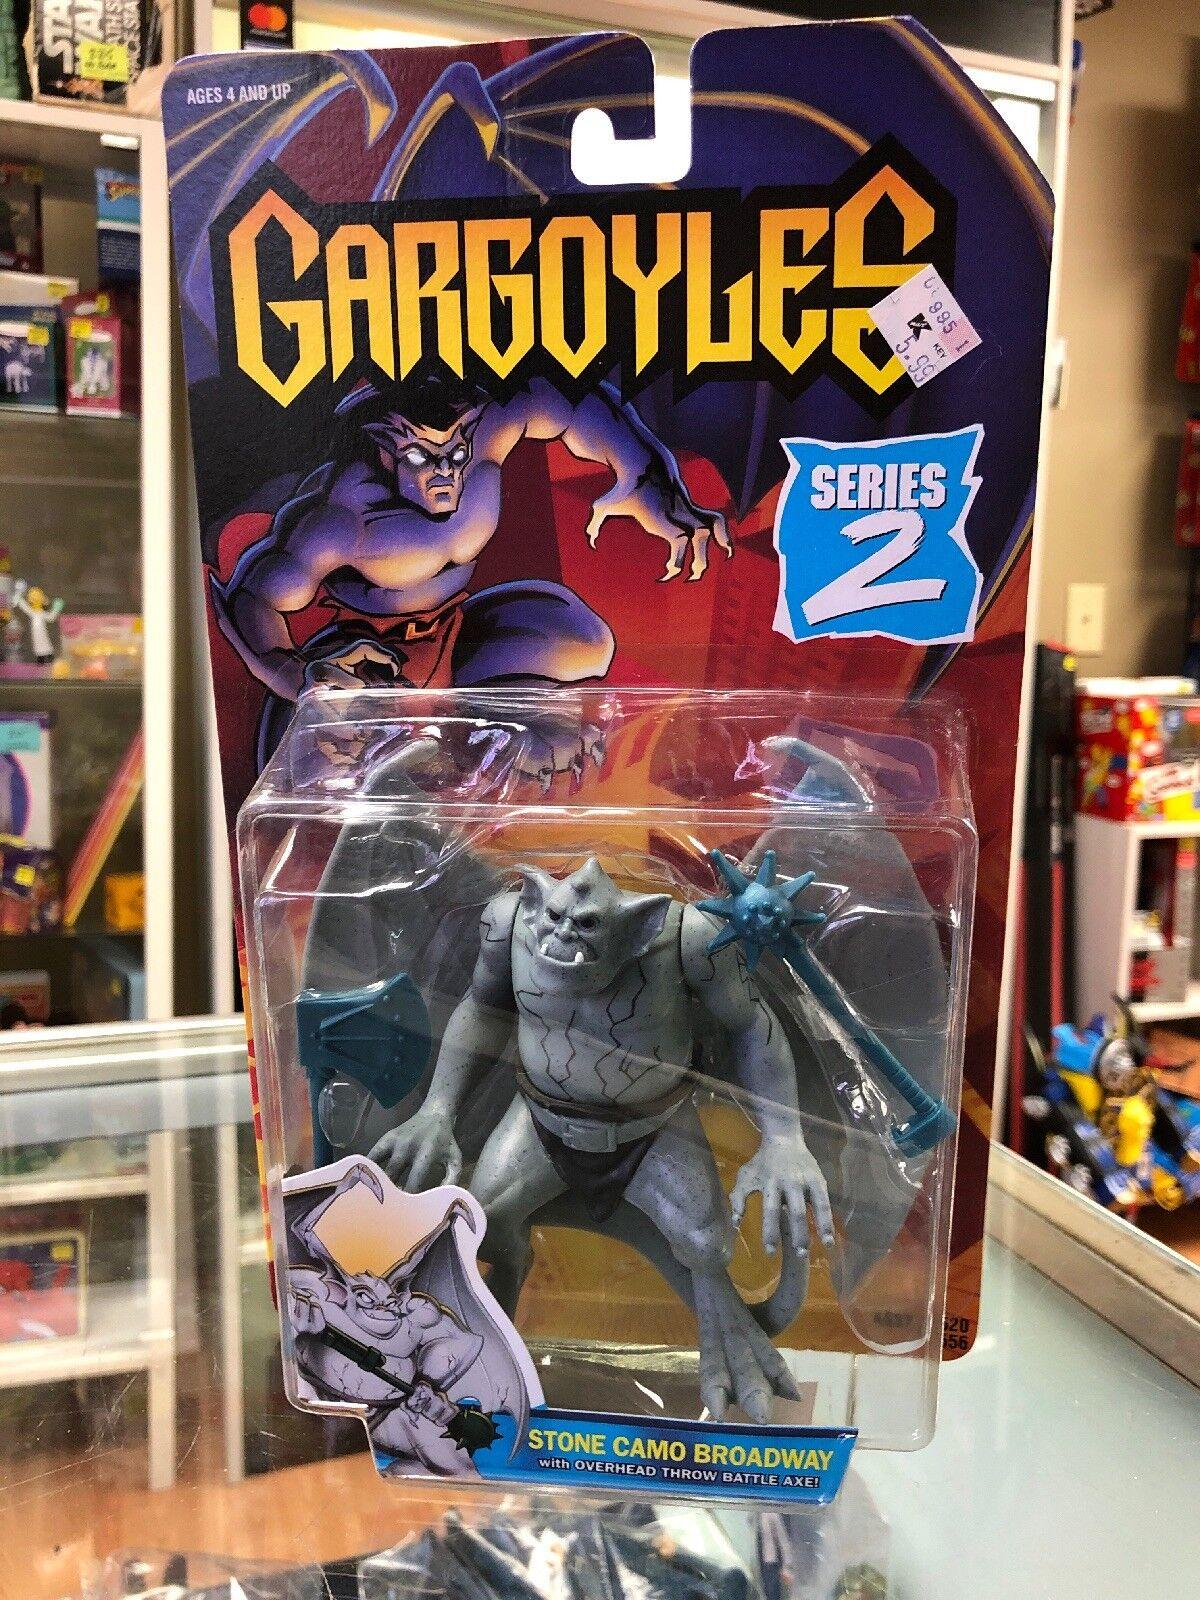 Gargoyles Series 2 Stone Camo Broadway with Overhead Throw Battle Axe